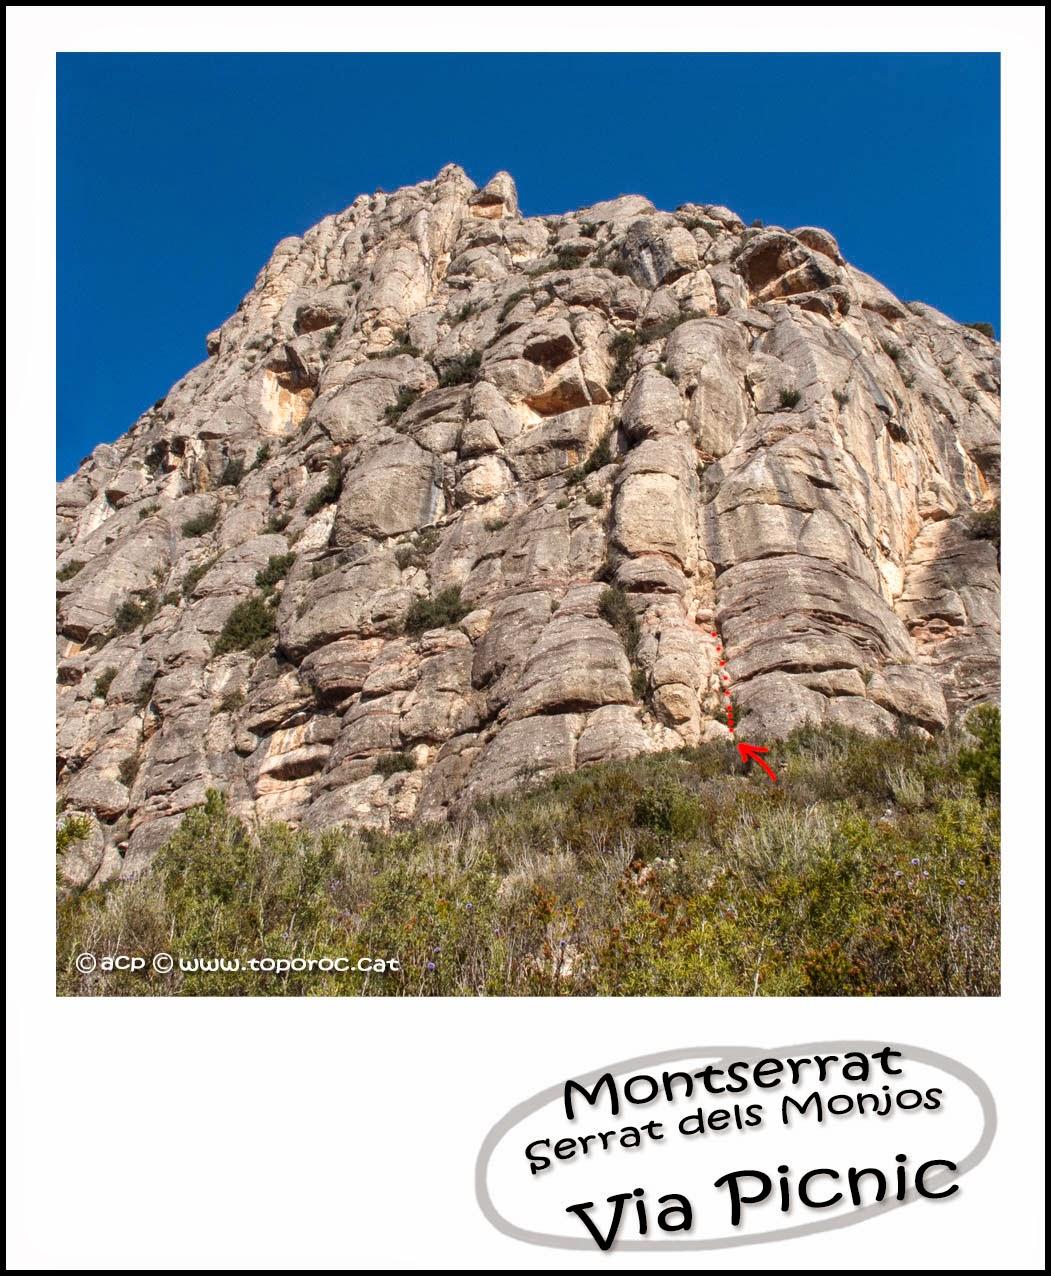 Topo-roc-ressenya-Vies-Montserrat